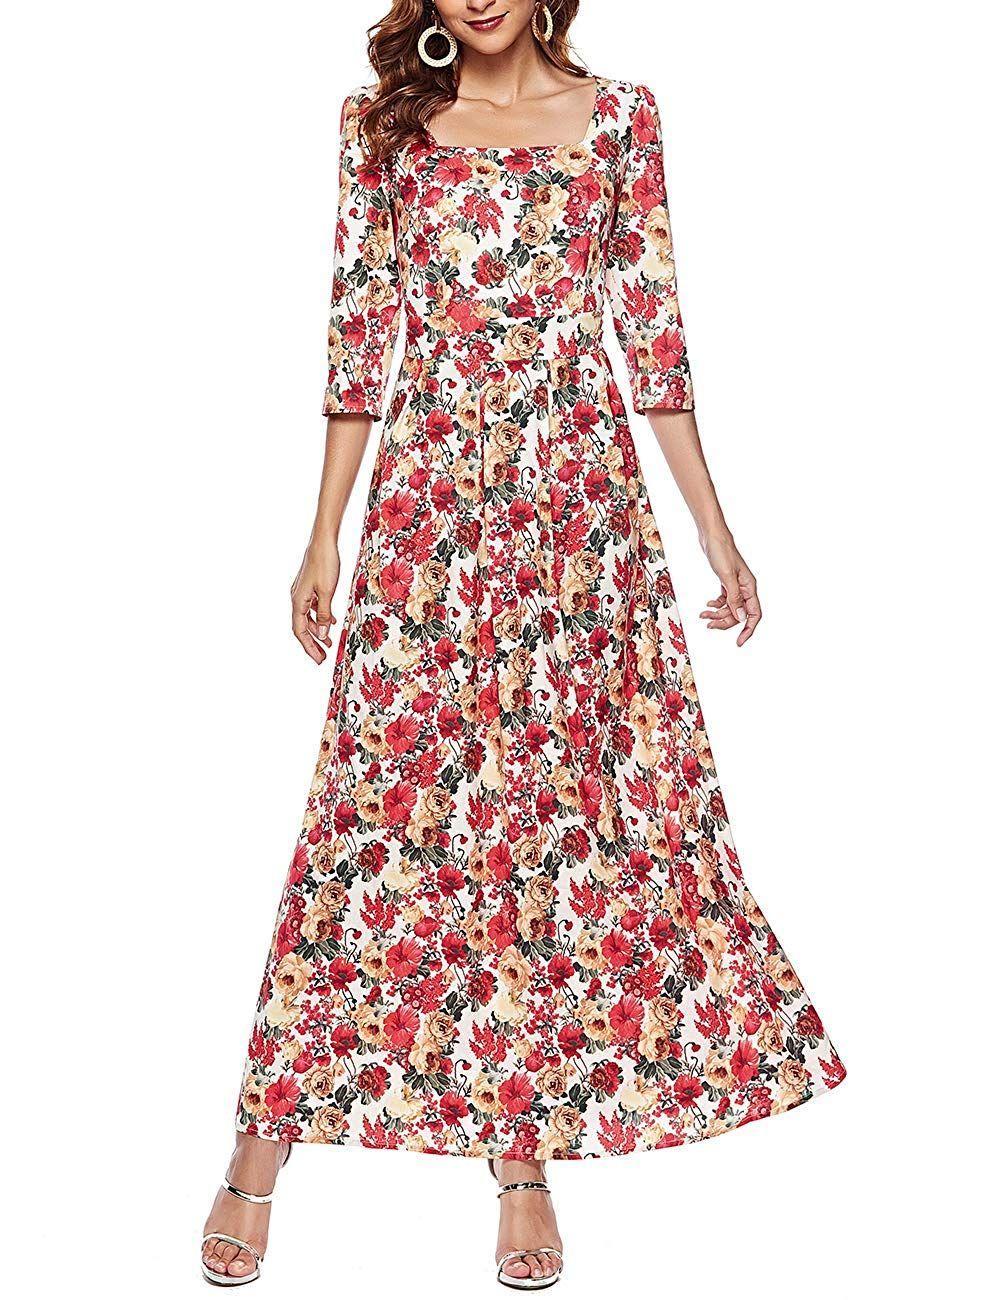 Simple Flavor Womens Sleeveless Floral Maxi Dress Casual Summer Long Dress At Amazon Women S Clothing S Long Dress Casual Summer Long Summer Dresses Maxi Dress [ 1300 x 1000 Pixel ]